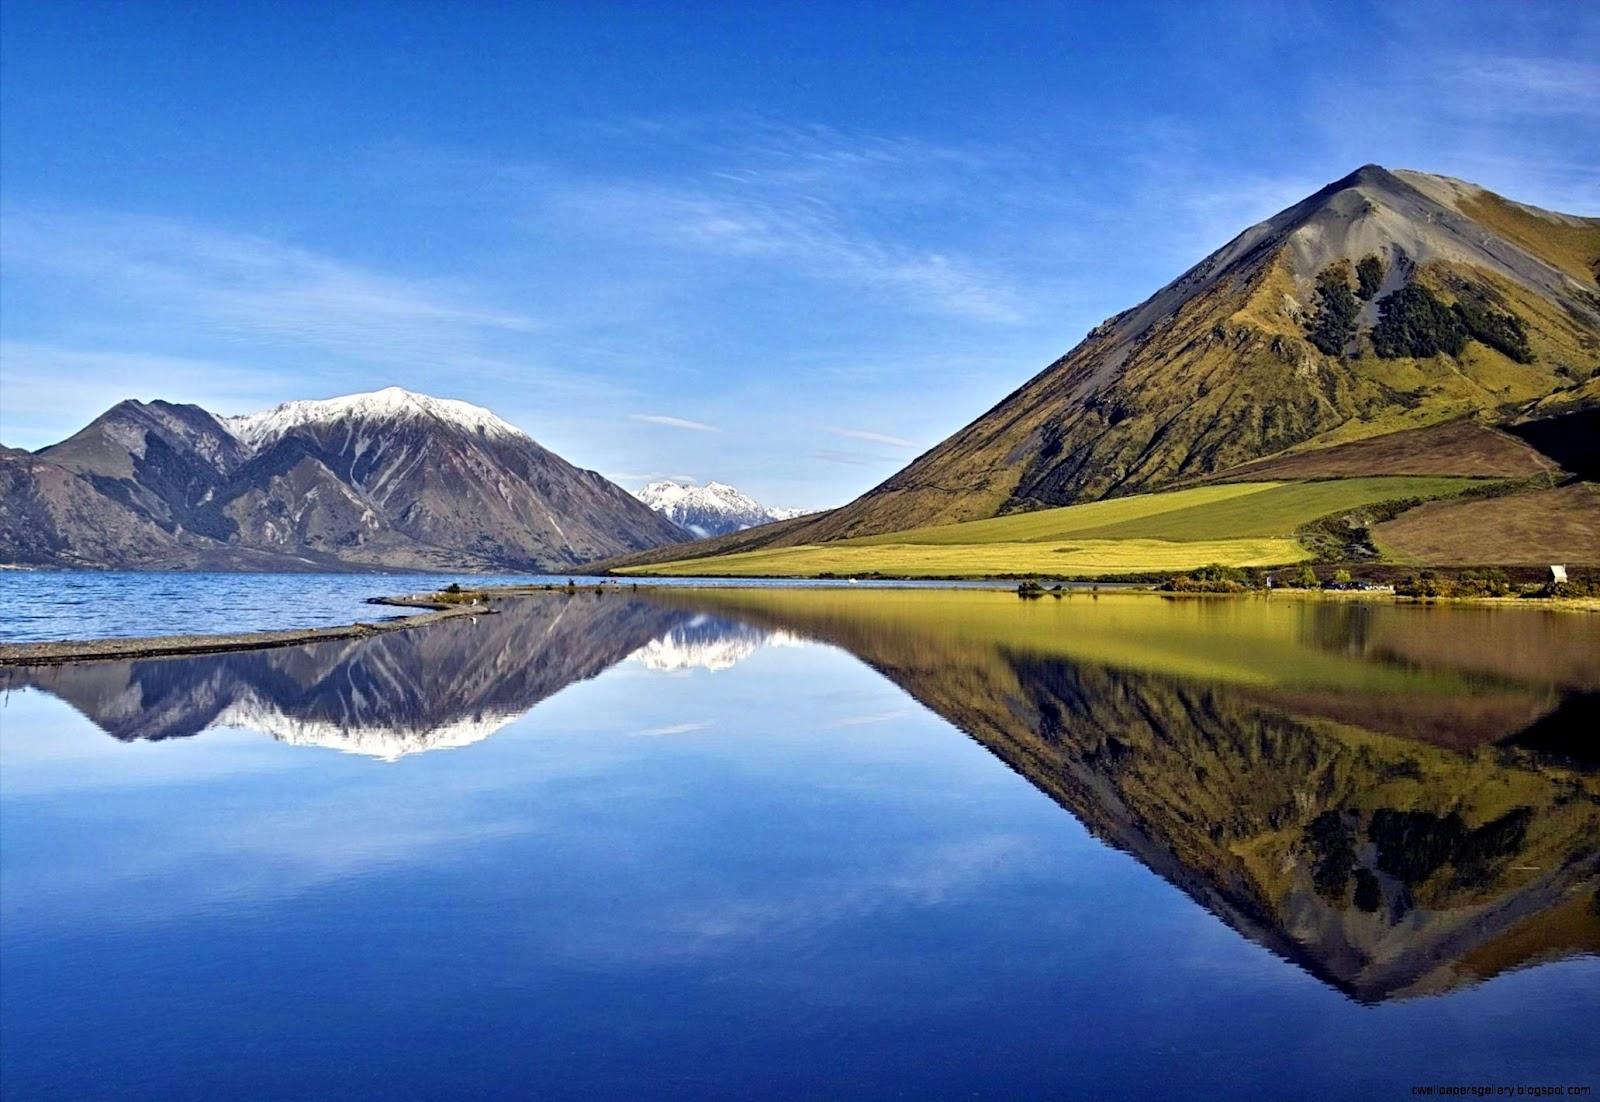 Mountain Nature Photography